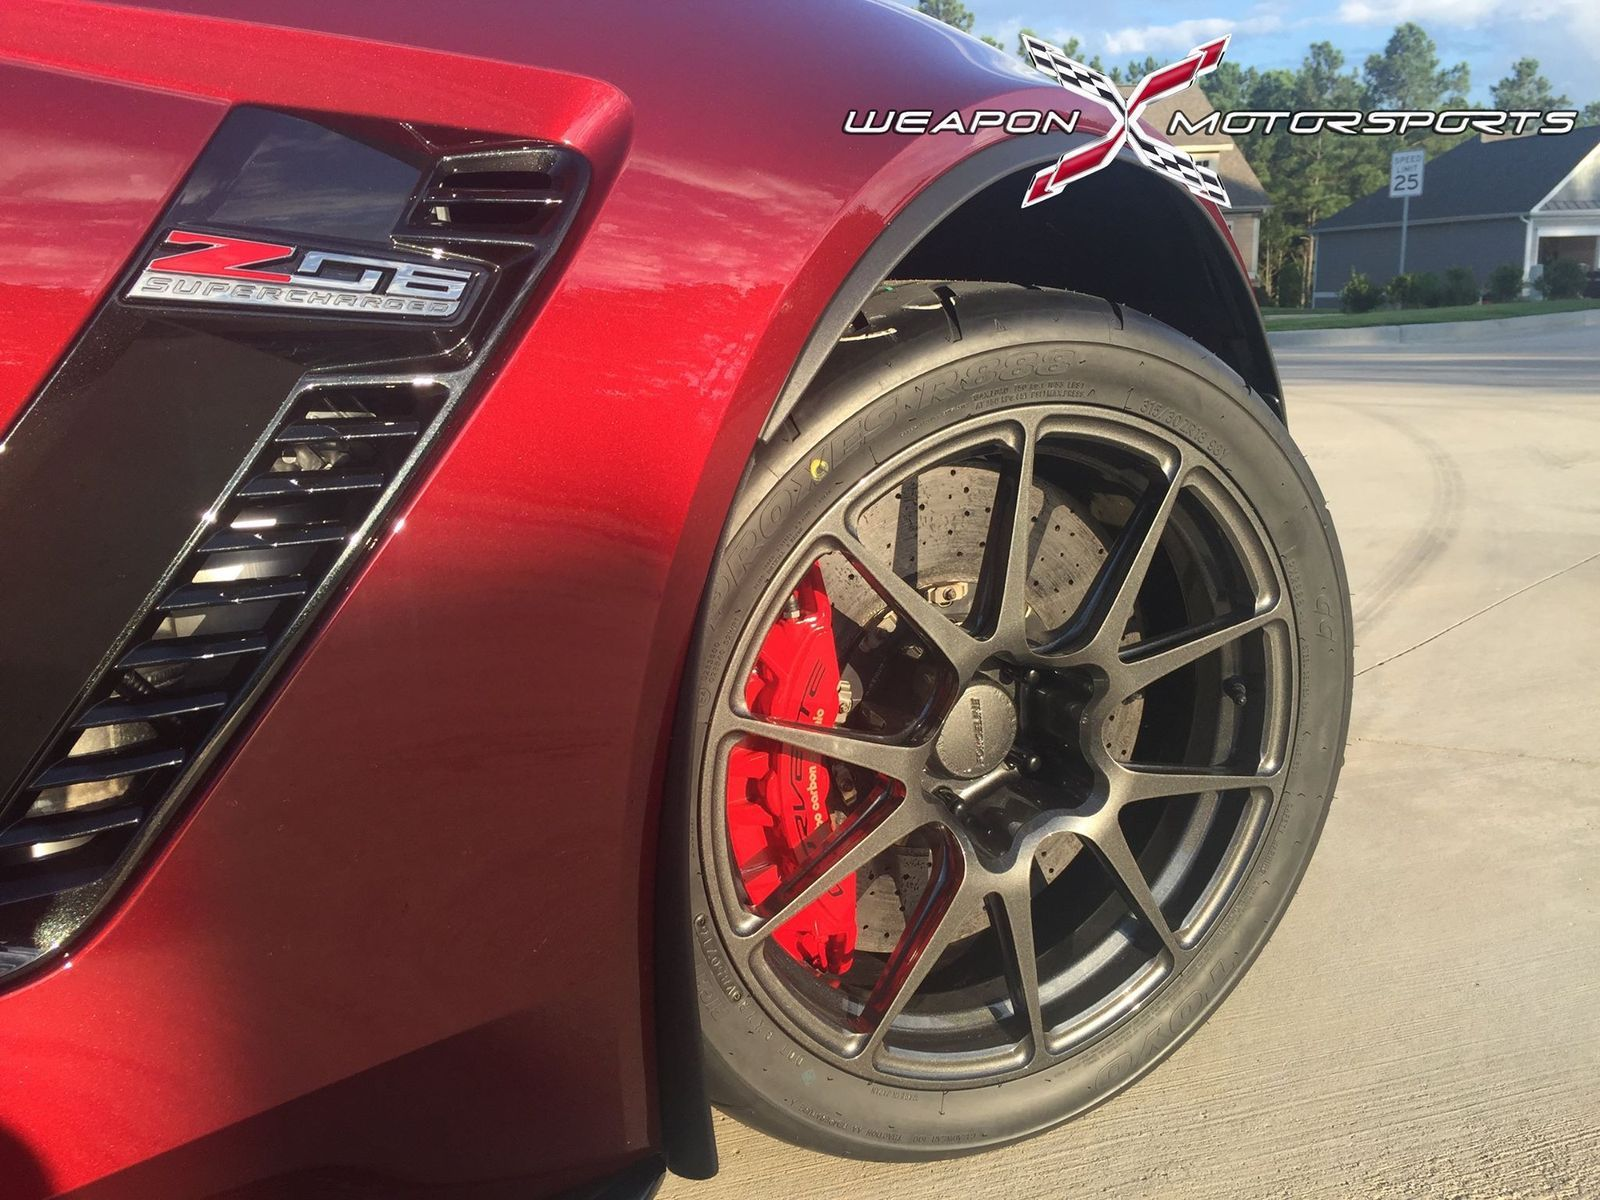 2016 Chevrolet Corvette Z06 | Eric Fleming's C7 Corvette Z06 on Forgeline One Piece Forged Monoblock GA1R Open Lug Cap Edition Wheels